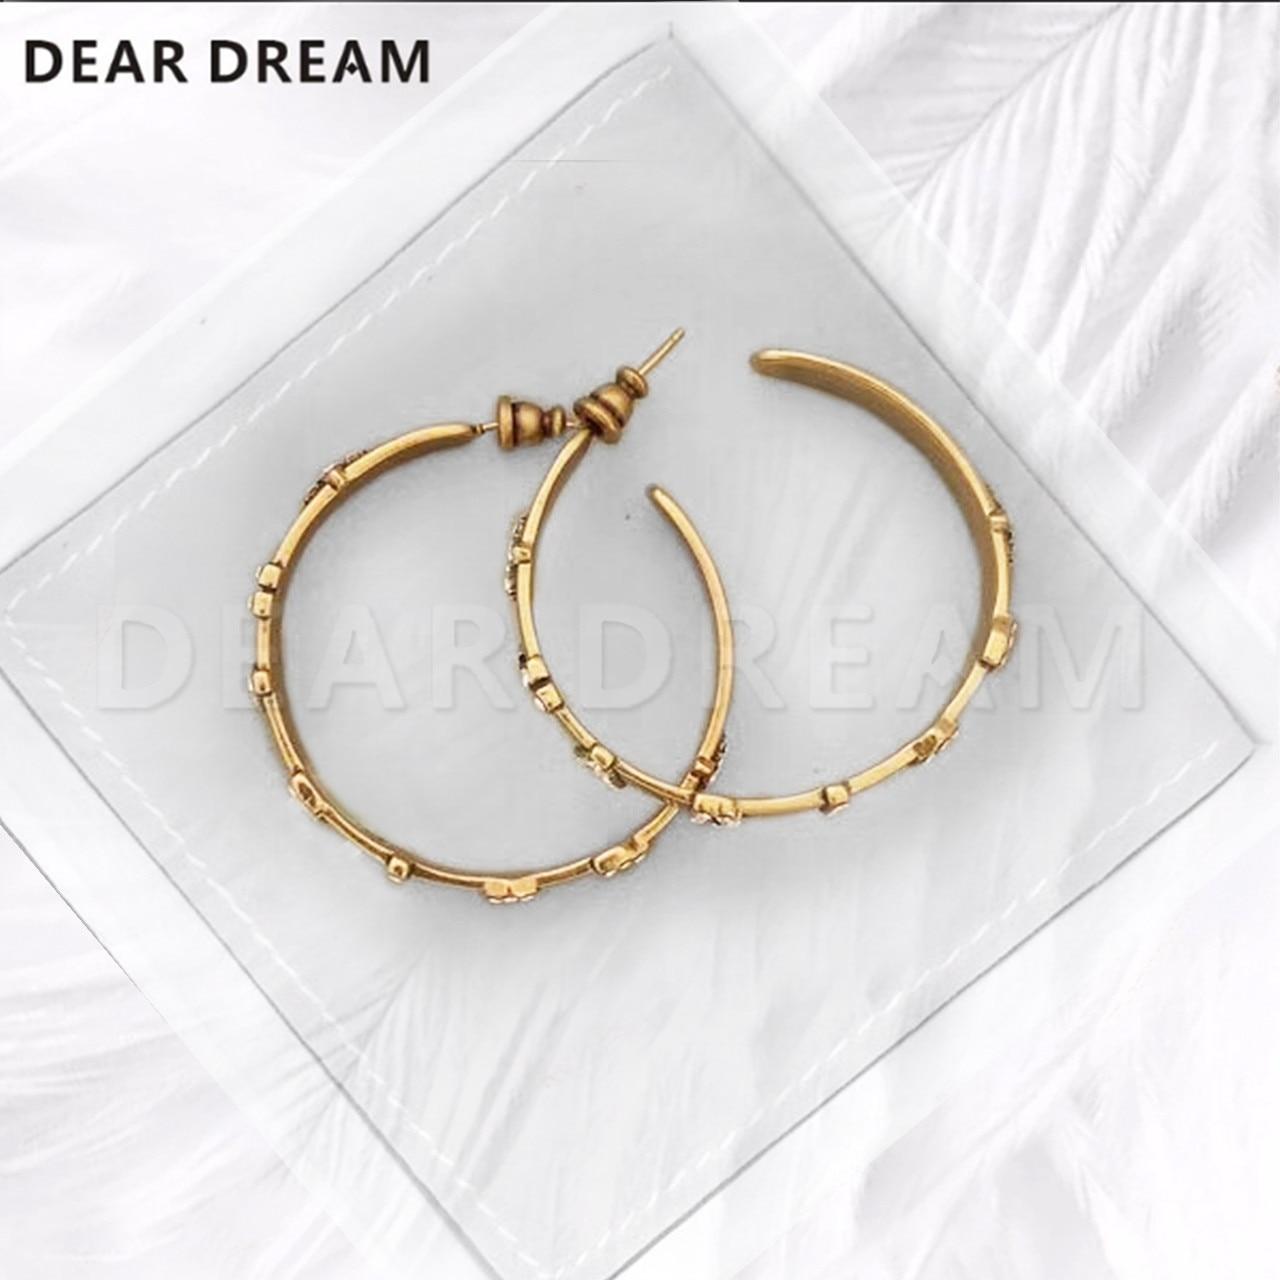 Fashion Girl Classic Stars Letter Hoop Earring Jewerlry for Women Trendy Jewelry wholesale Earings Women Accessories-in Hoop Earrings from Jewelry & Accessories